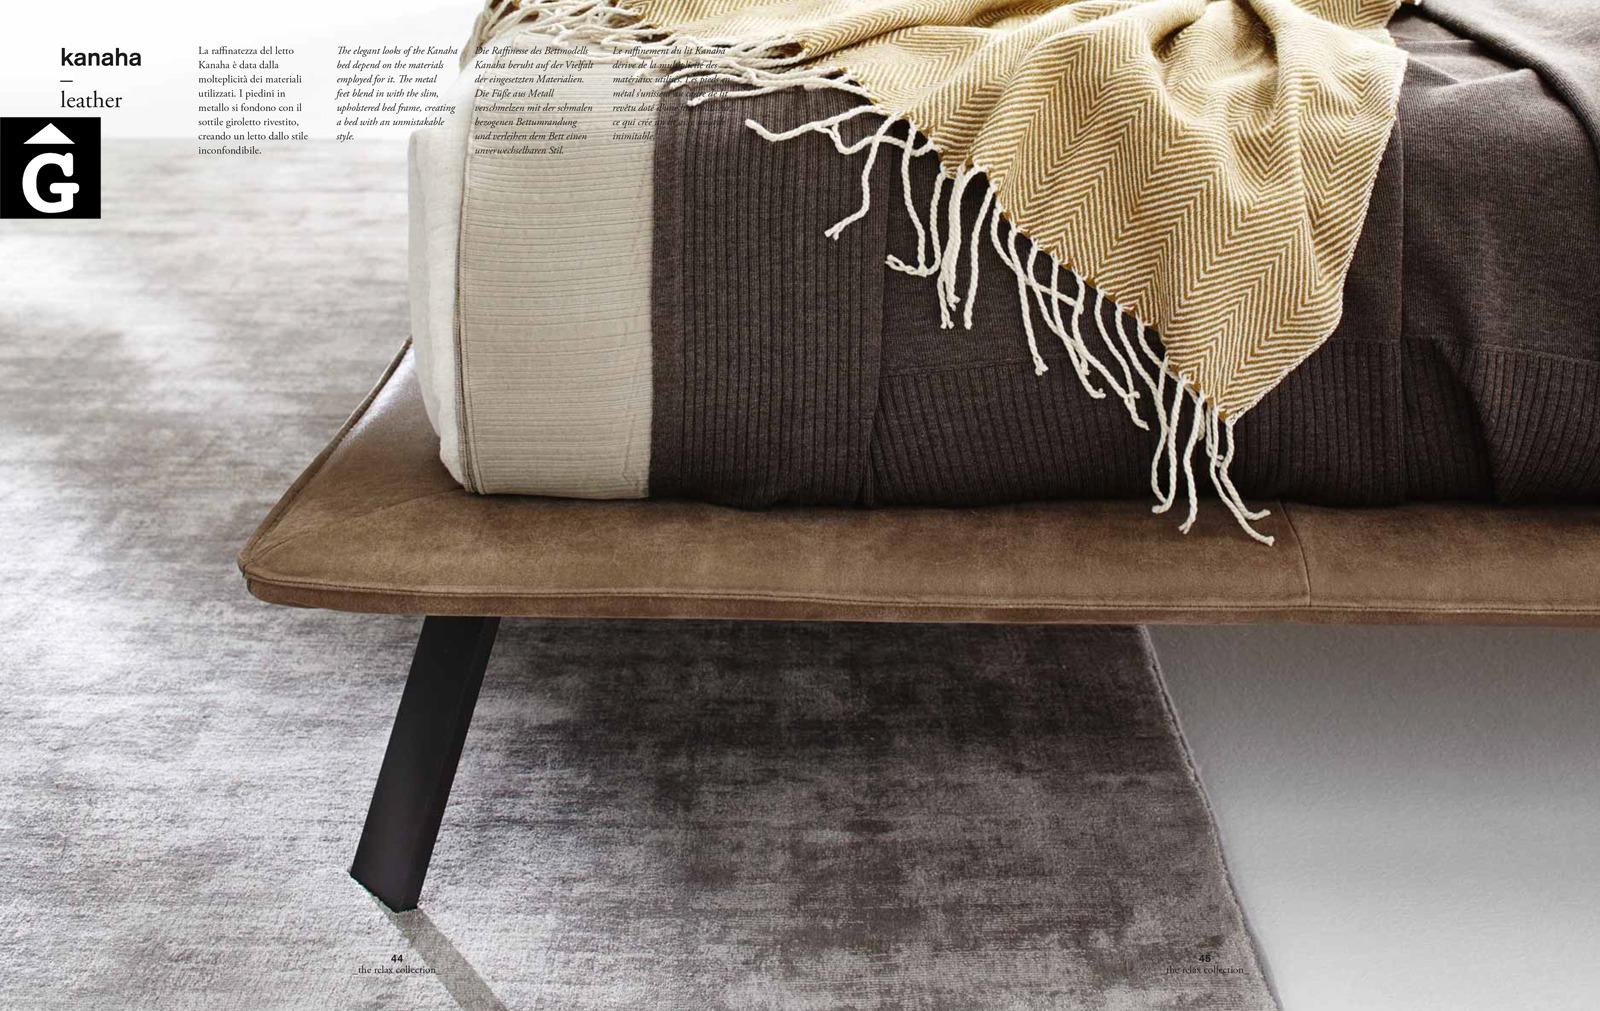 Kanaha llit entapissat detall peu - Ditre Italia llits entapissats disseny i qualitat alta by mobles Gifreu